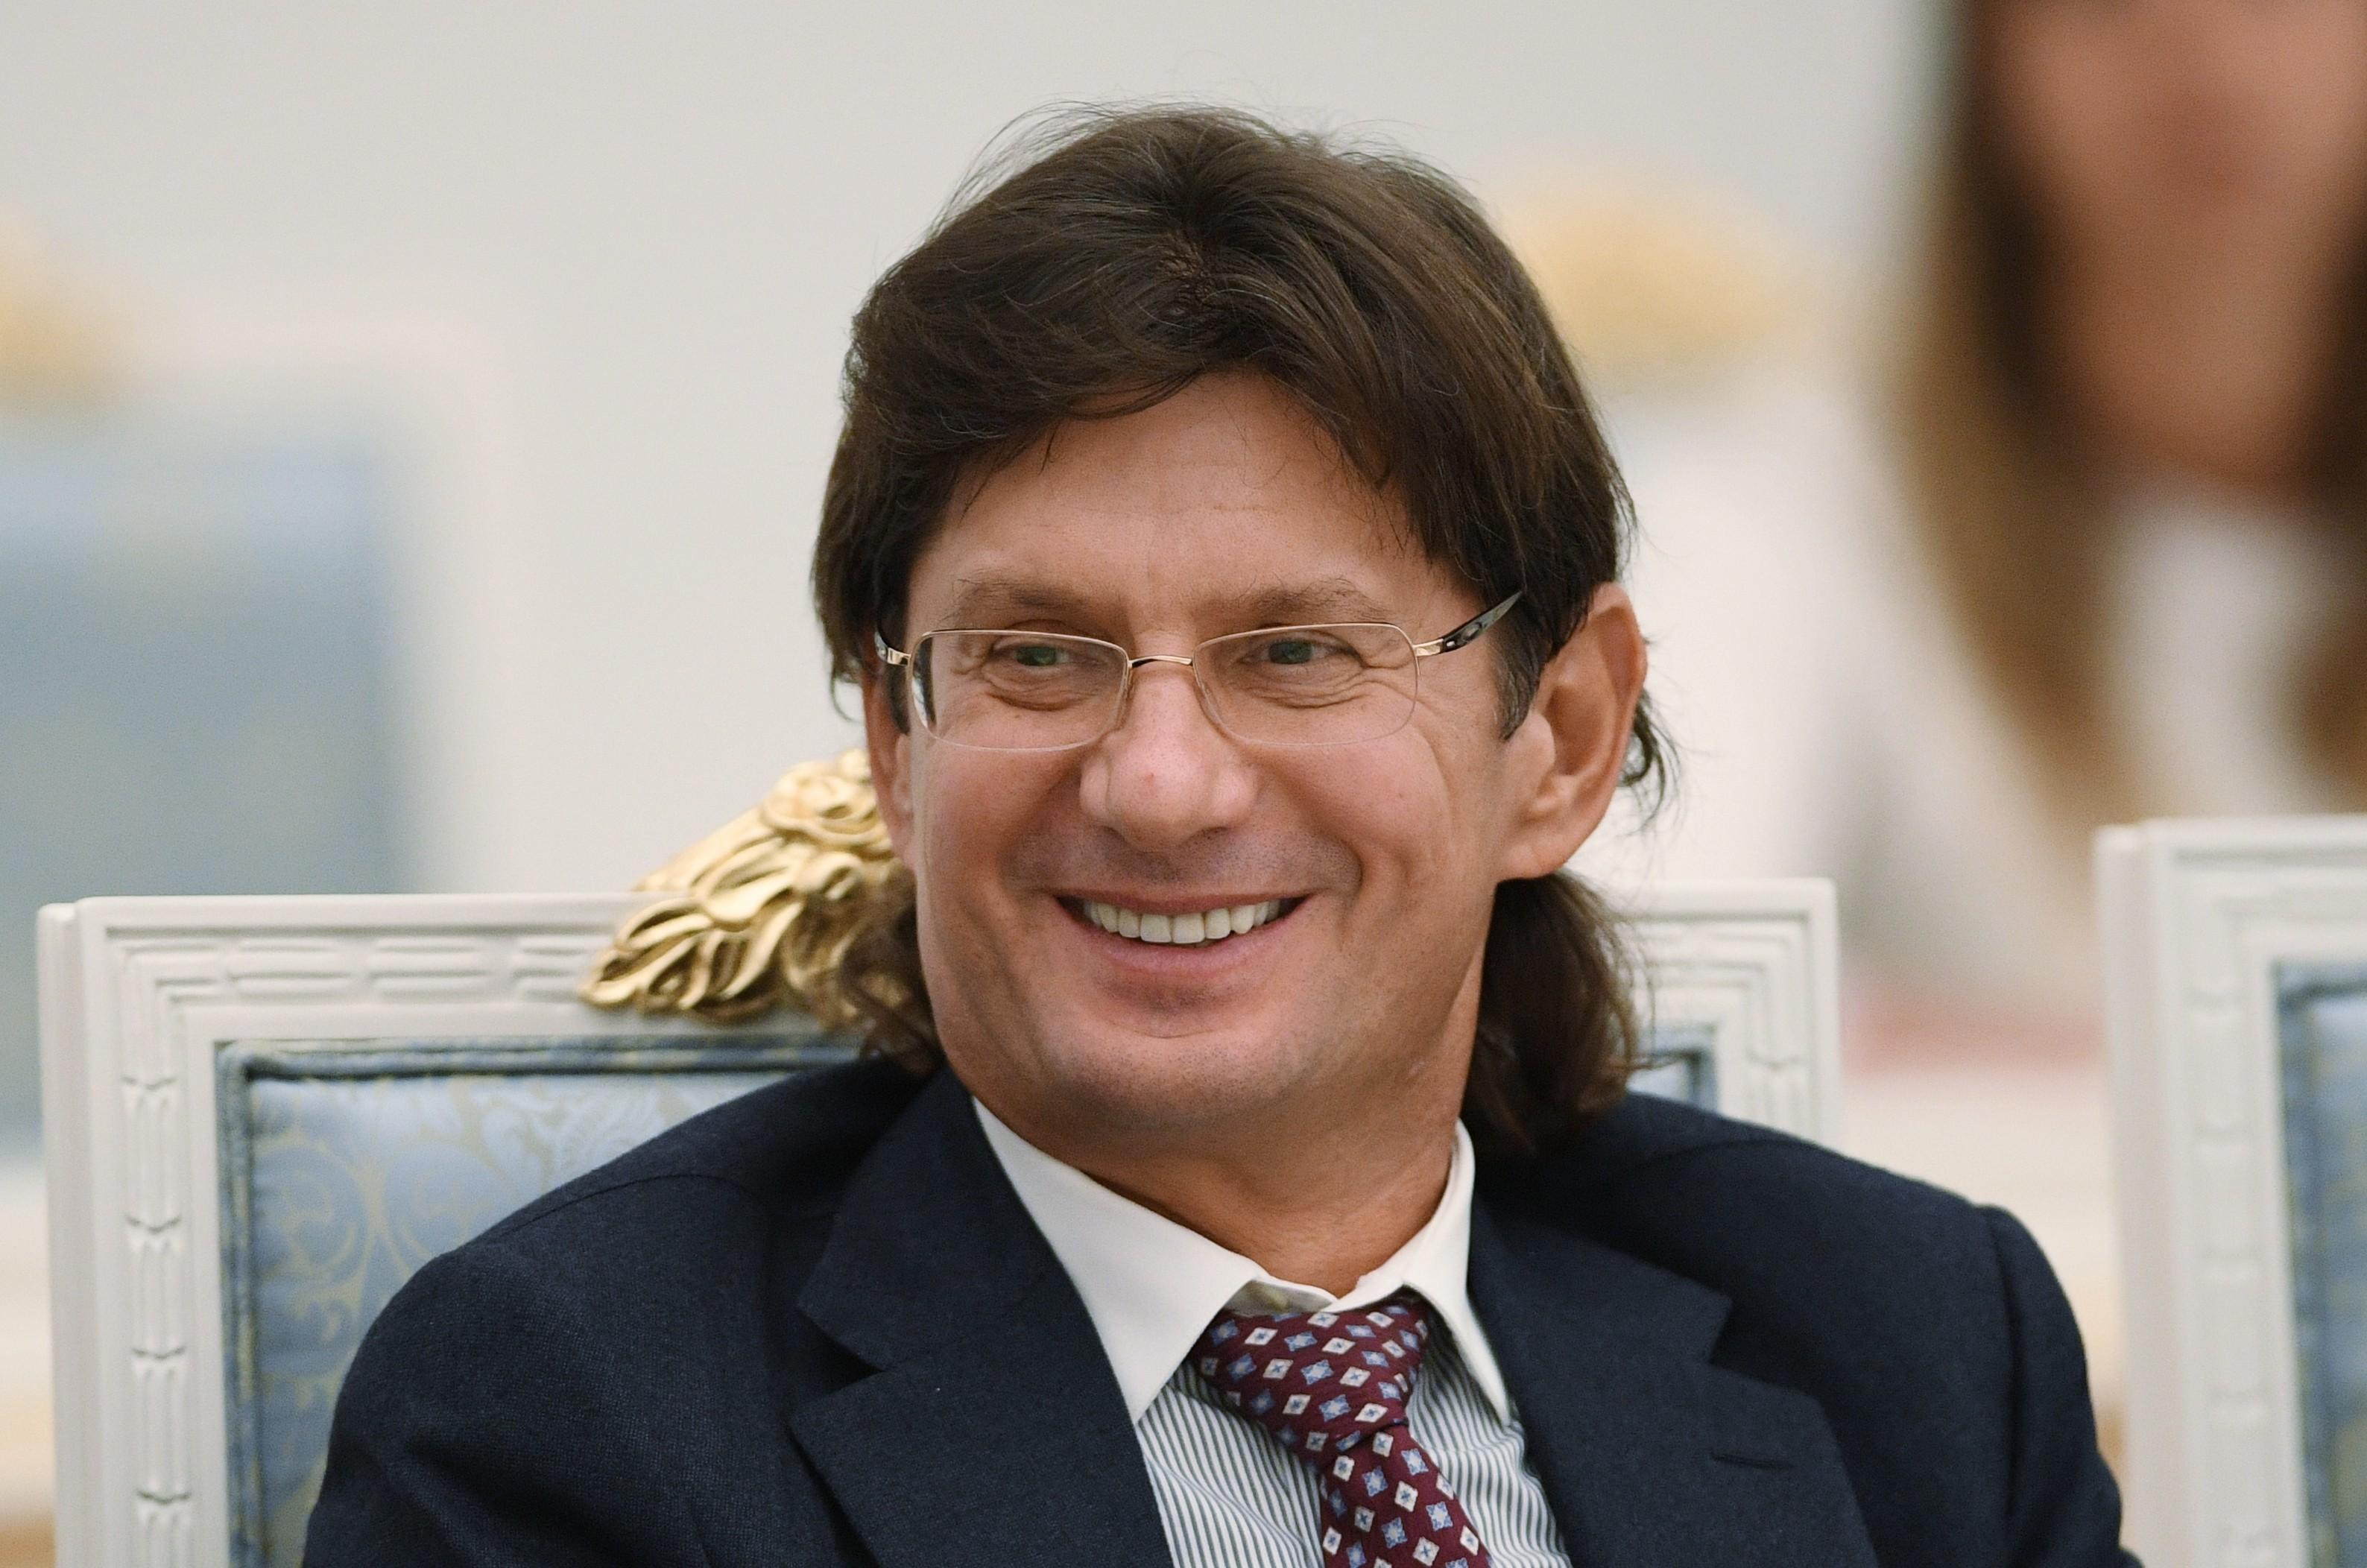 <p>Фото: &copy; РИА Новости/Алексей Филиппов&nbsp;</p>